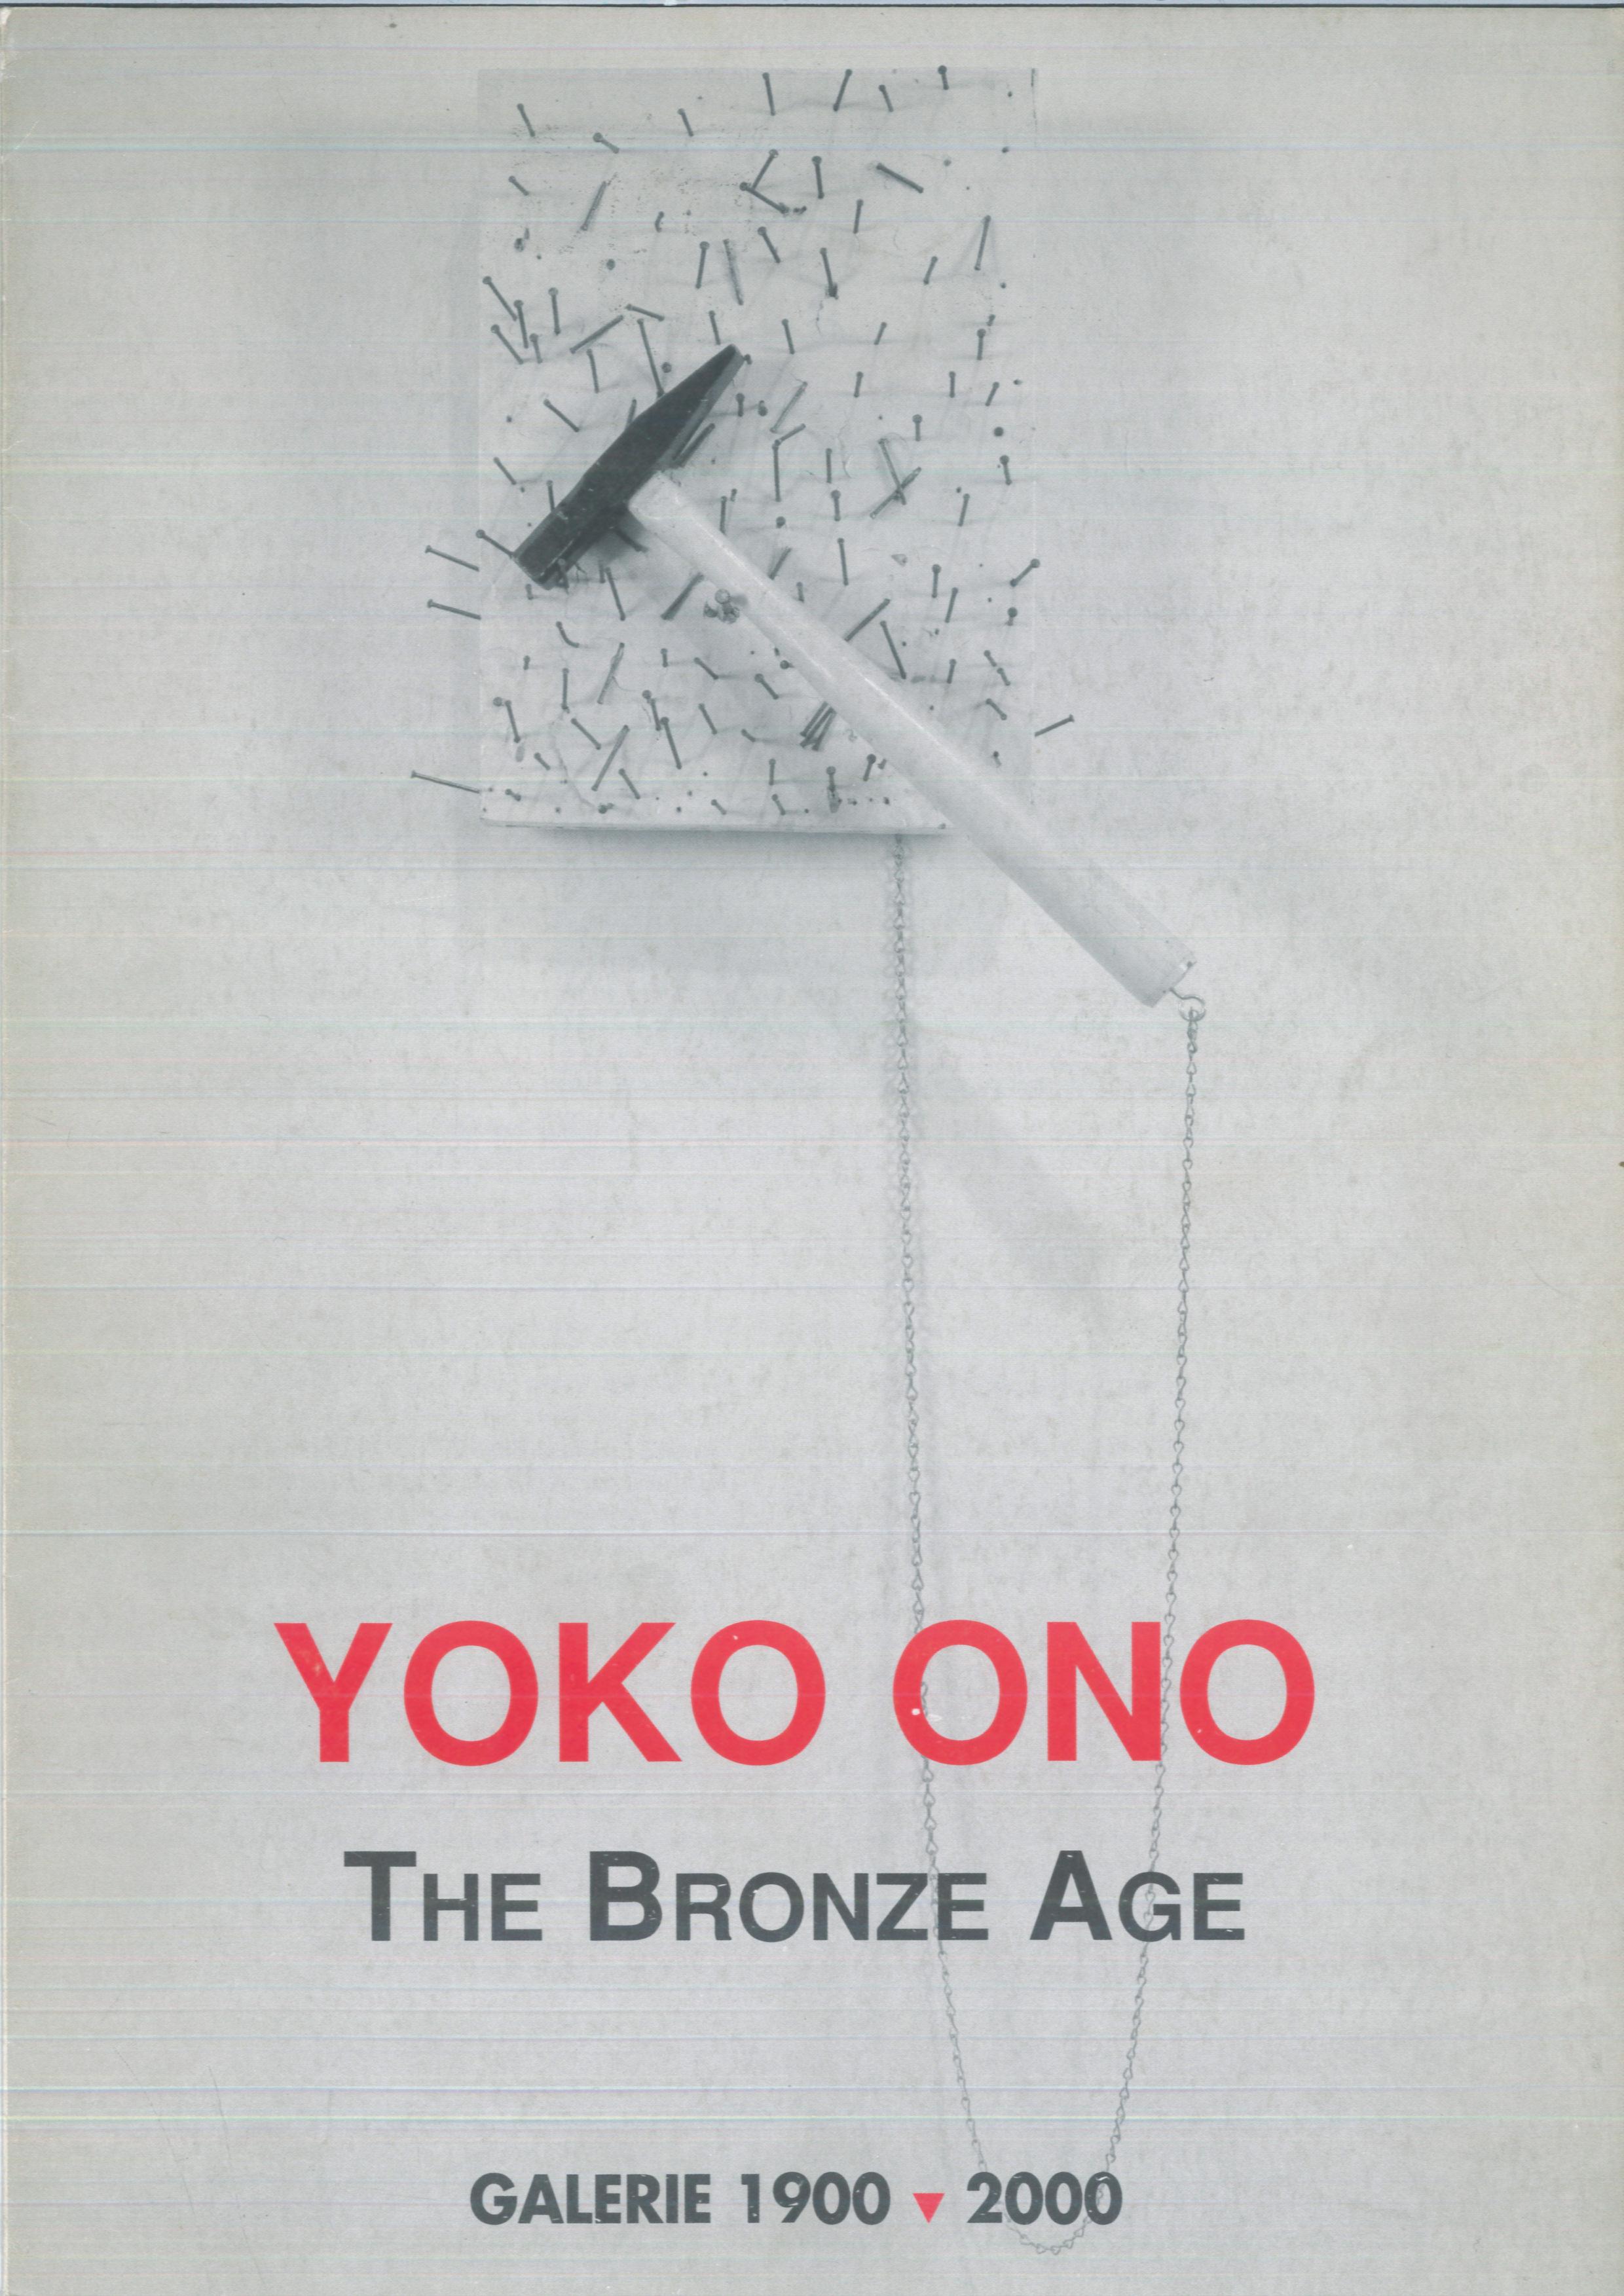 19-3-Yoko-Ono-The-Bronze-Age-Paris-FIAC-Galerie-1900-2000-1989